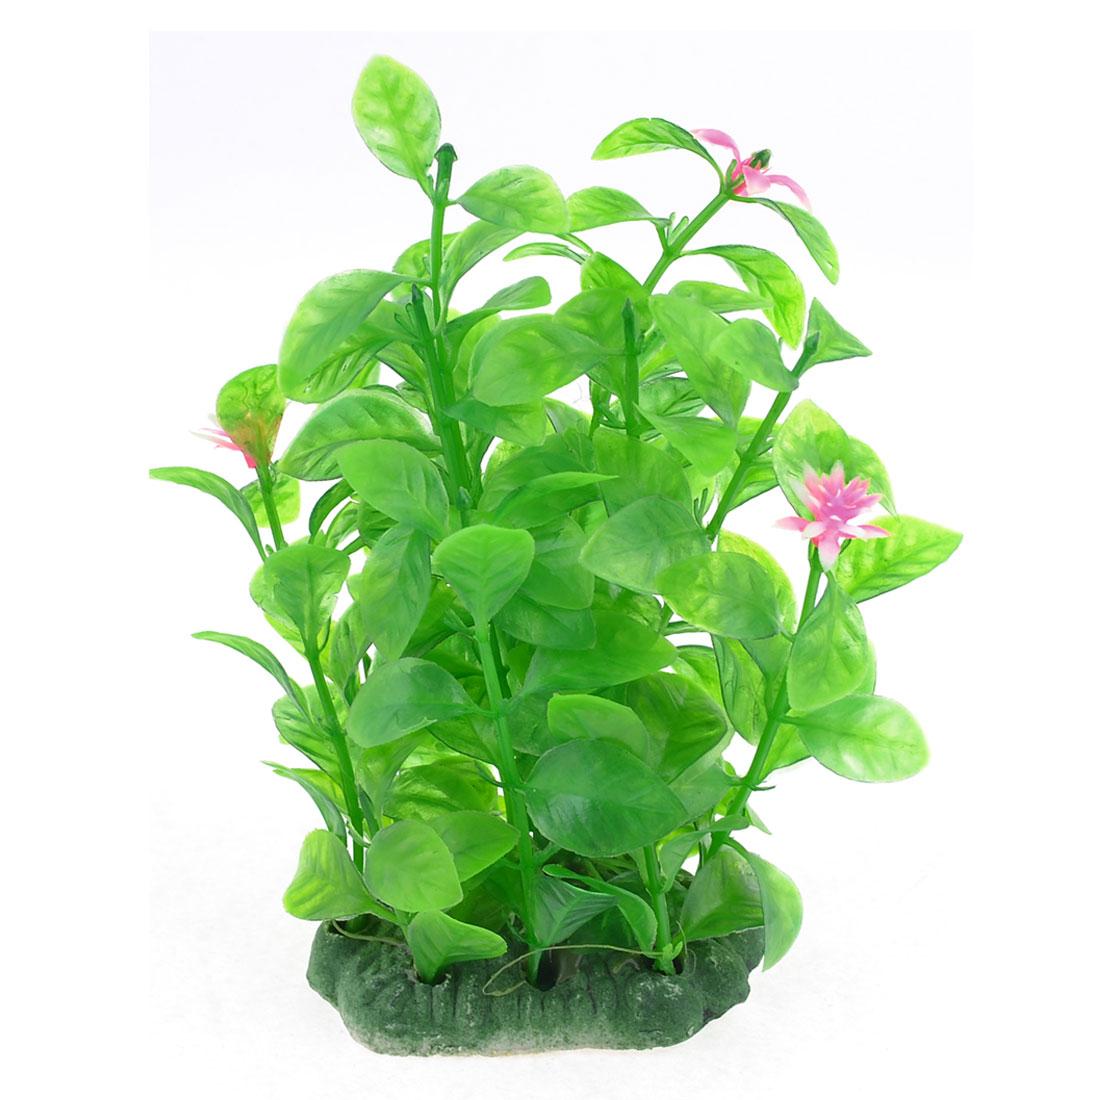 12cm Height Emulational Plant Grass Green for Aquarium Fish Tank